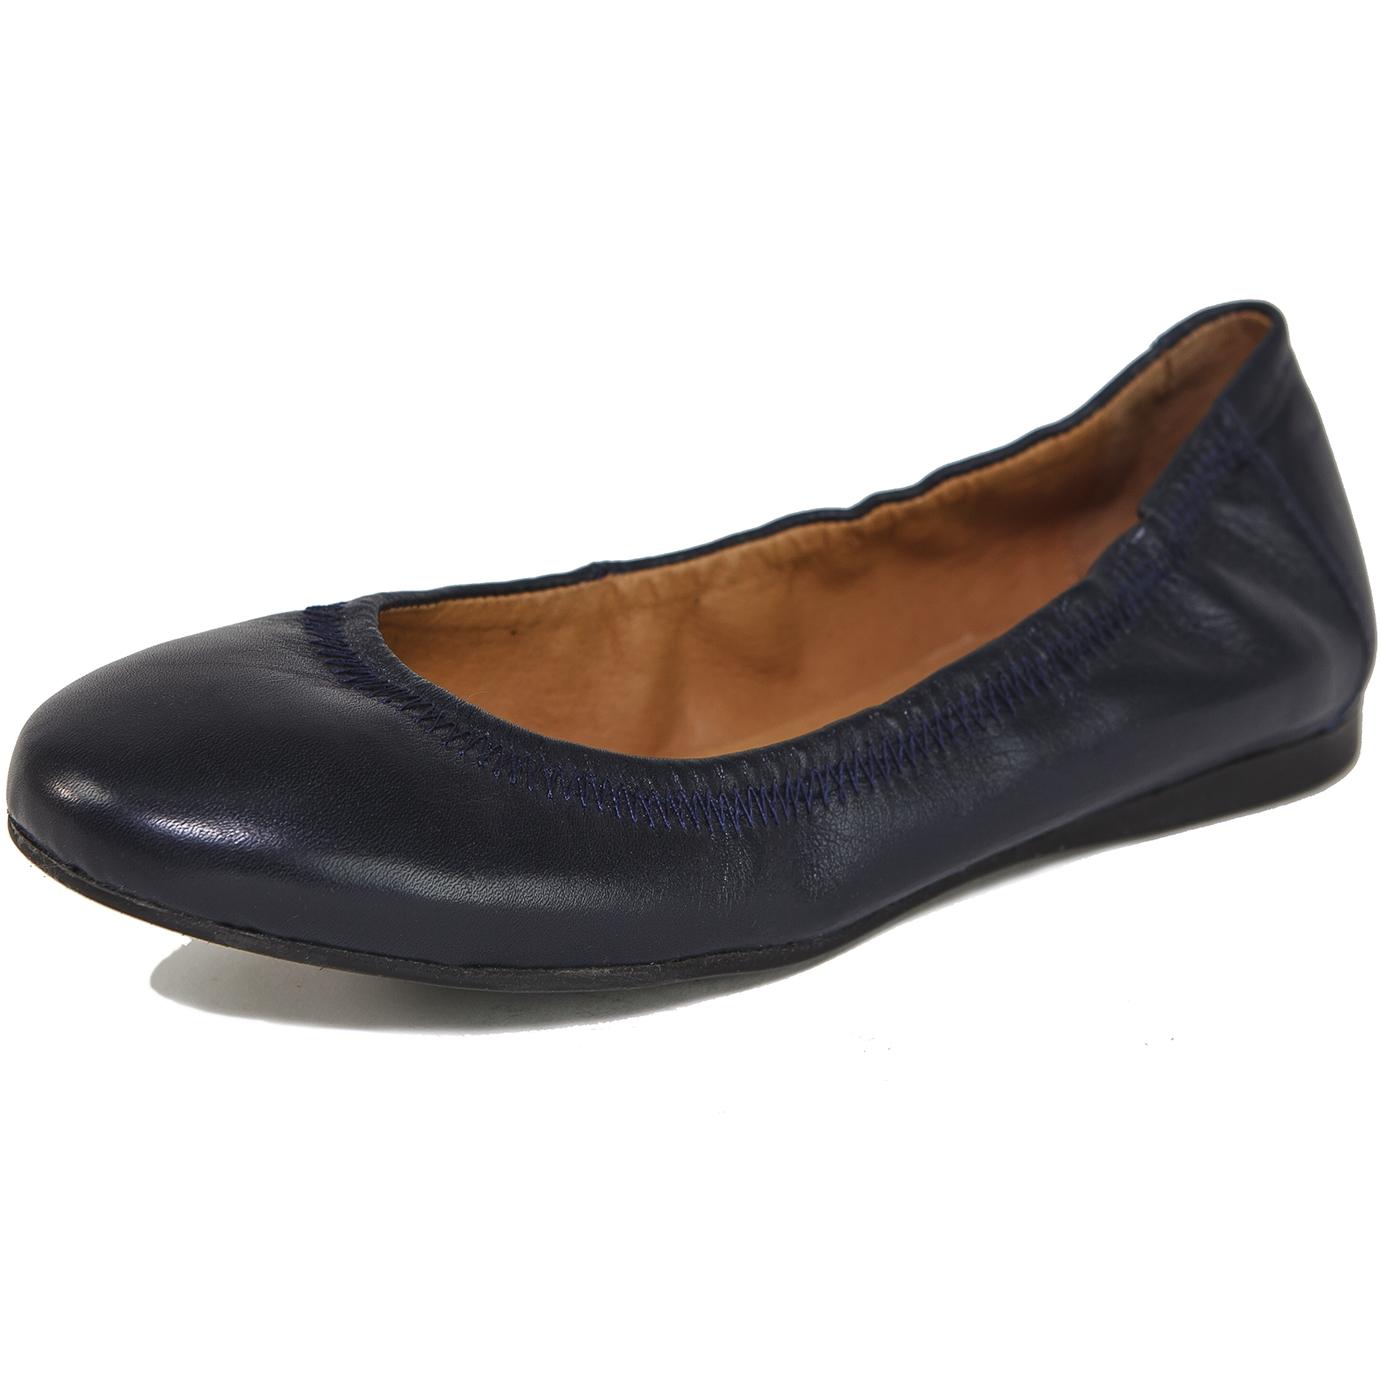 Unique My Biggest Shoe Idol Is Joan Helpern, The Late, Great Designer Of Joan &amp David